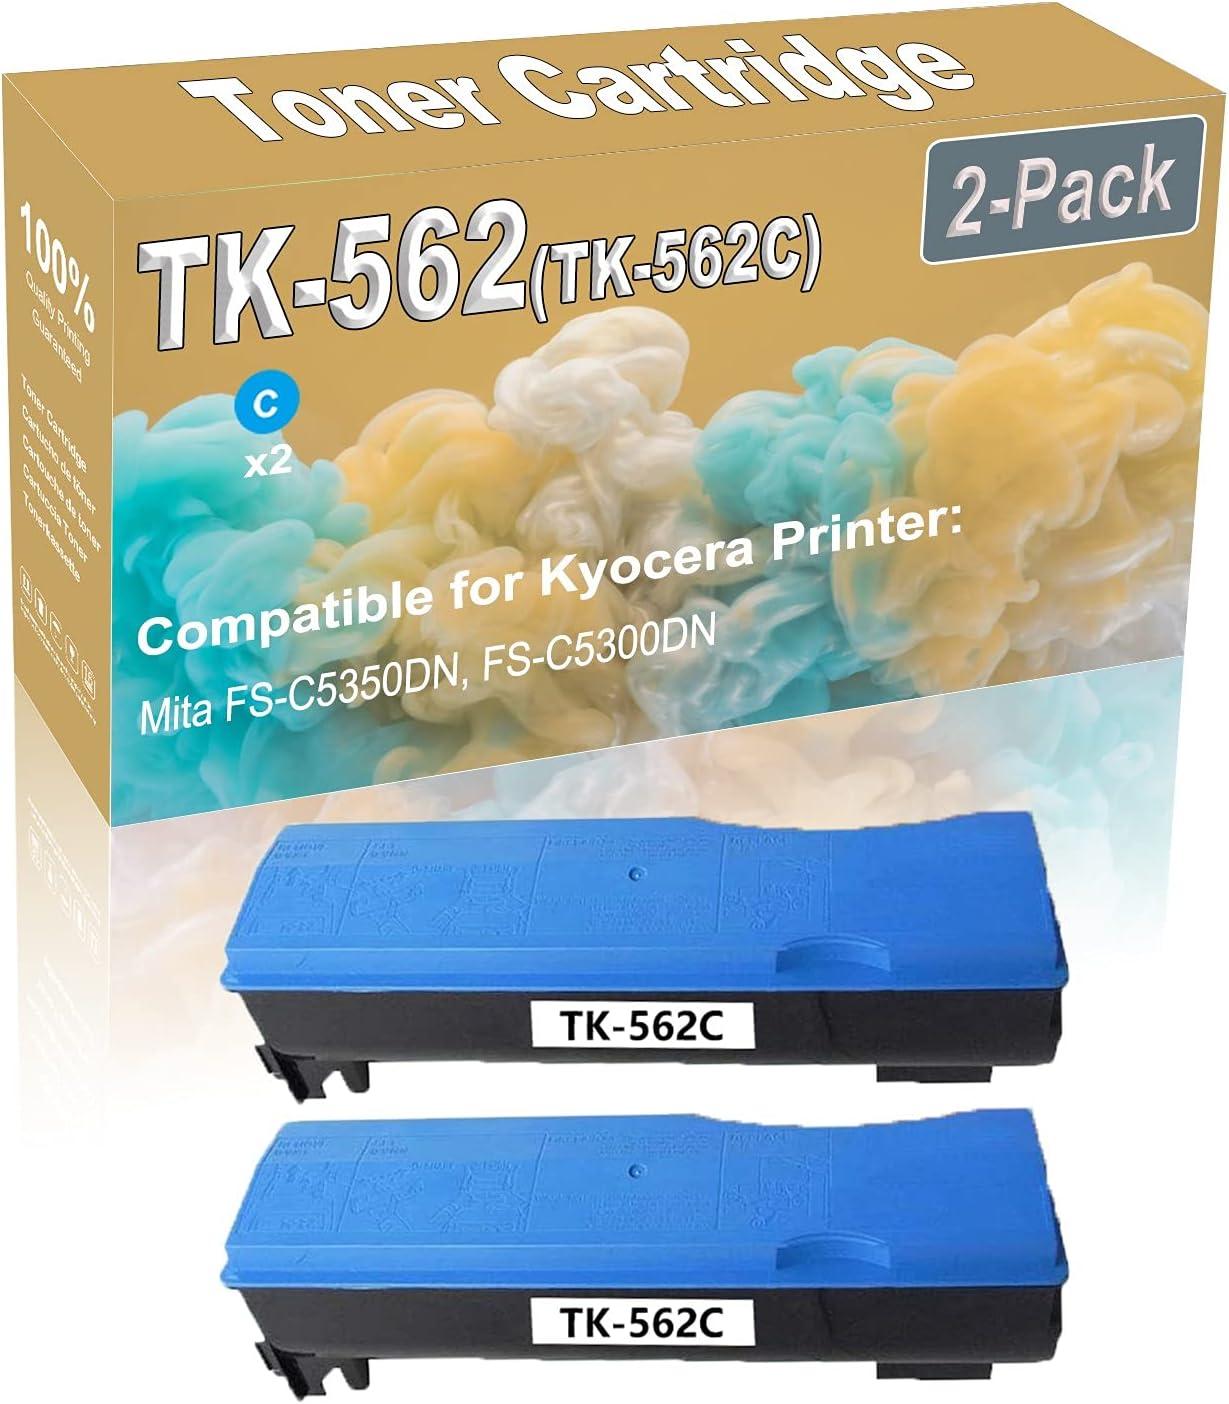 2-Pack (Cyan) Compatible Mita FS-C5350DN Laser Toner Cartridge (High Capacity) Replacement for Kyocera TK-562 (TK-562C) Printer Toner Cartridge